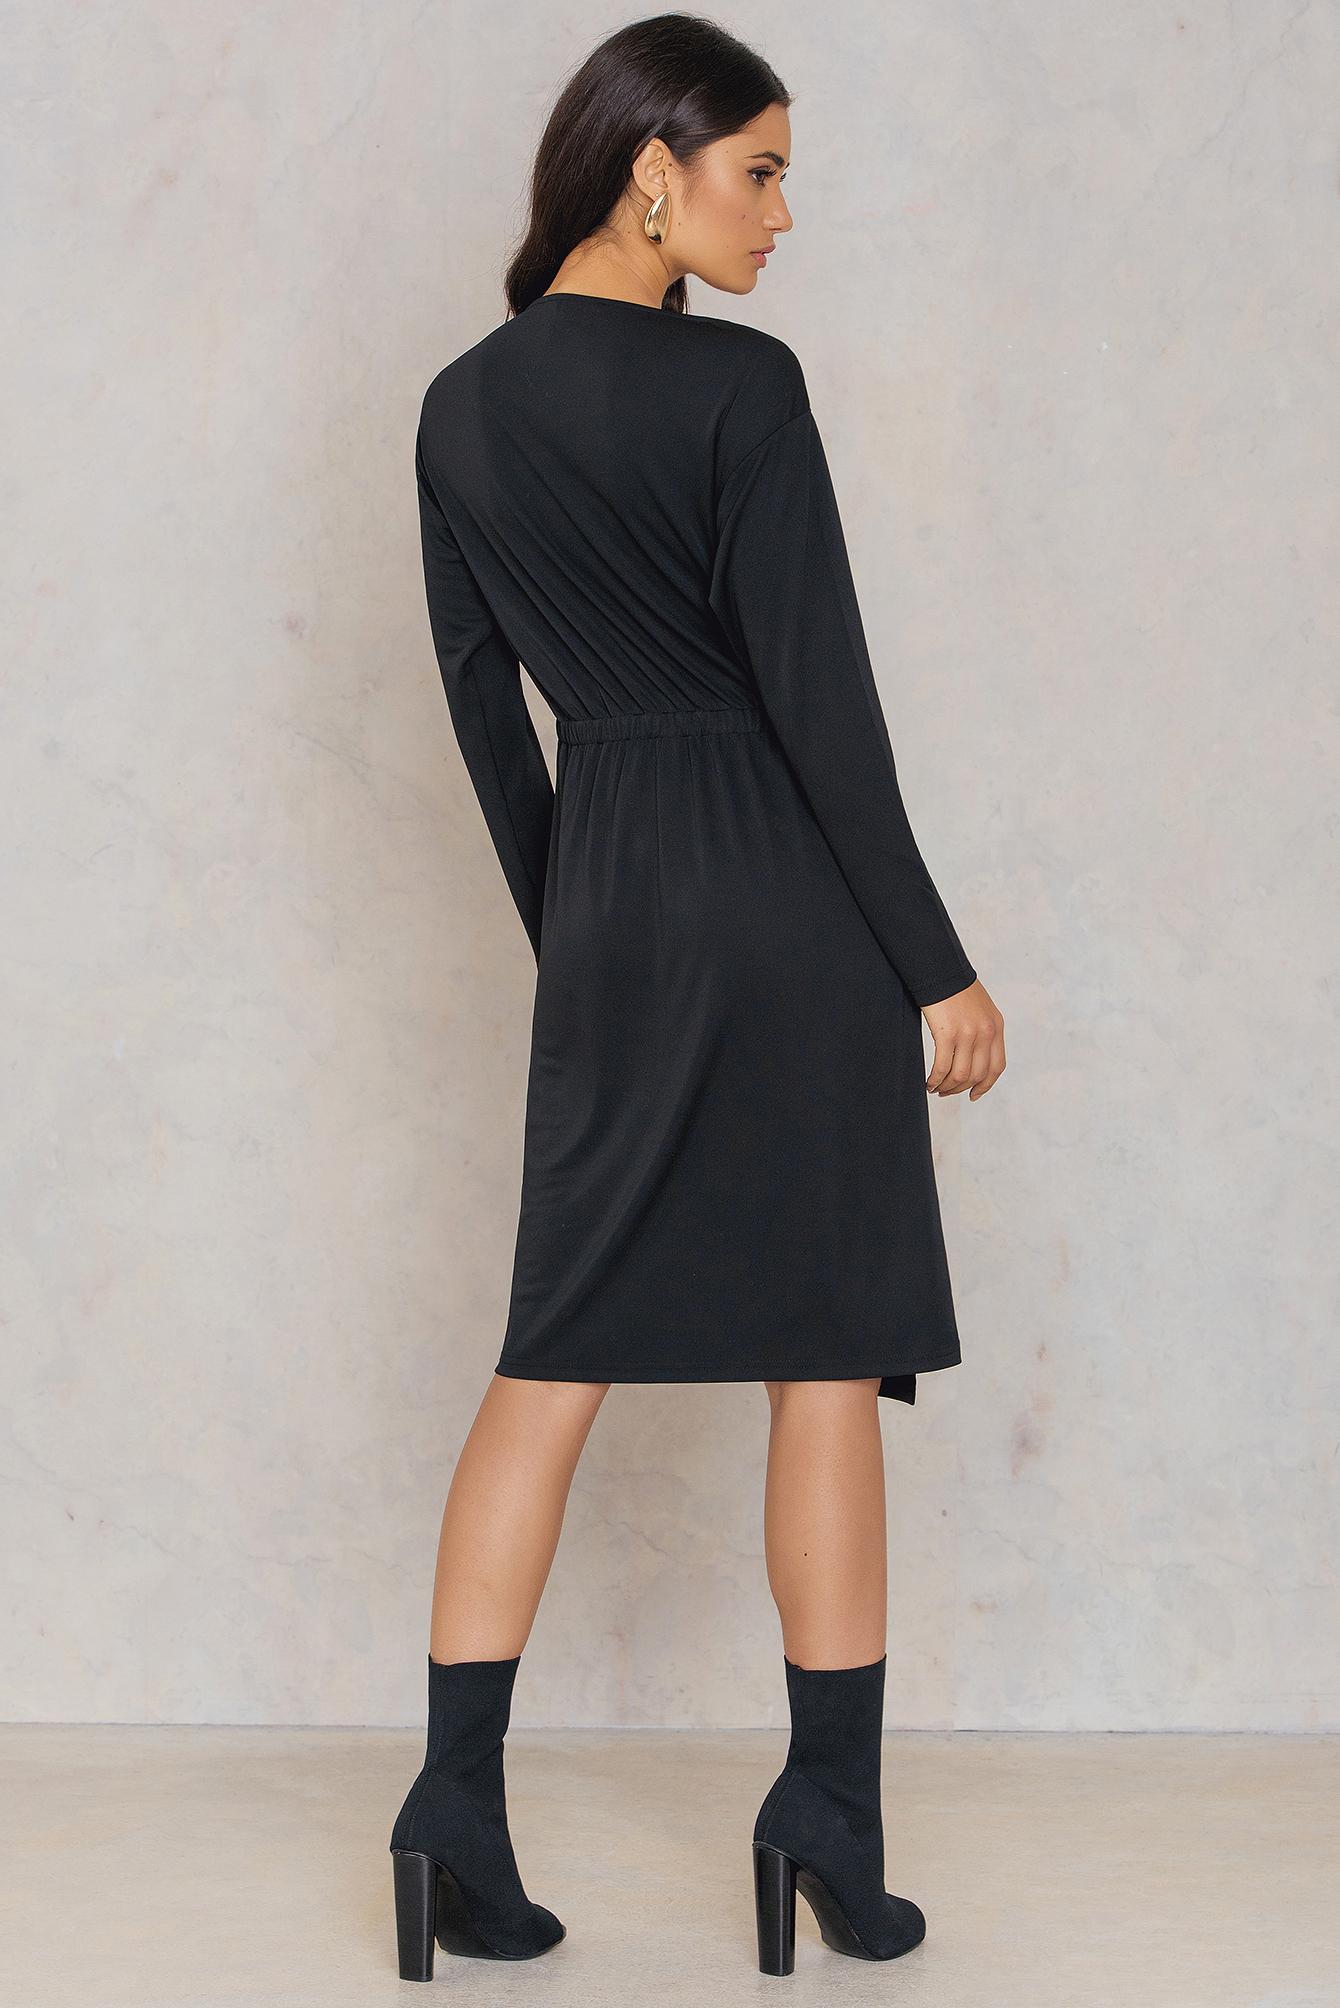 assymetric jersey dress filippa k